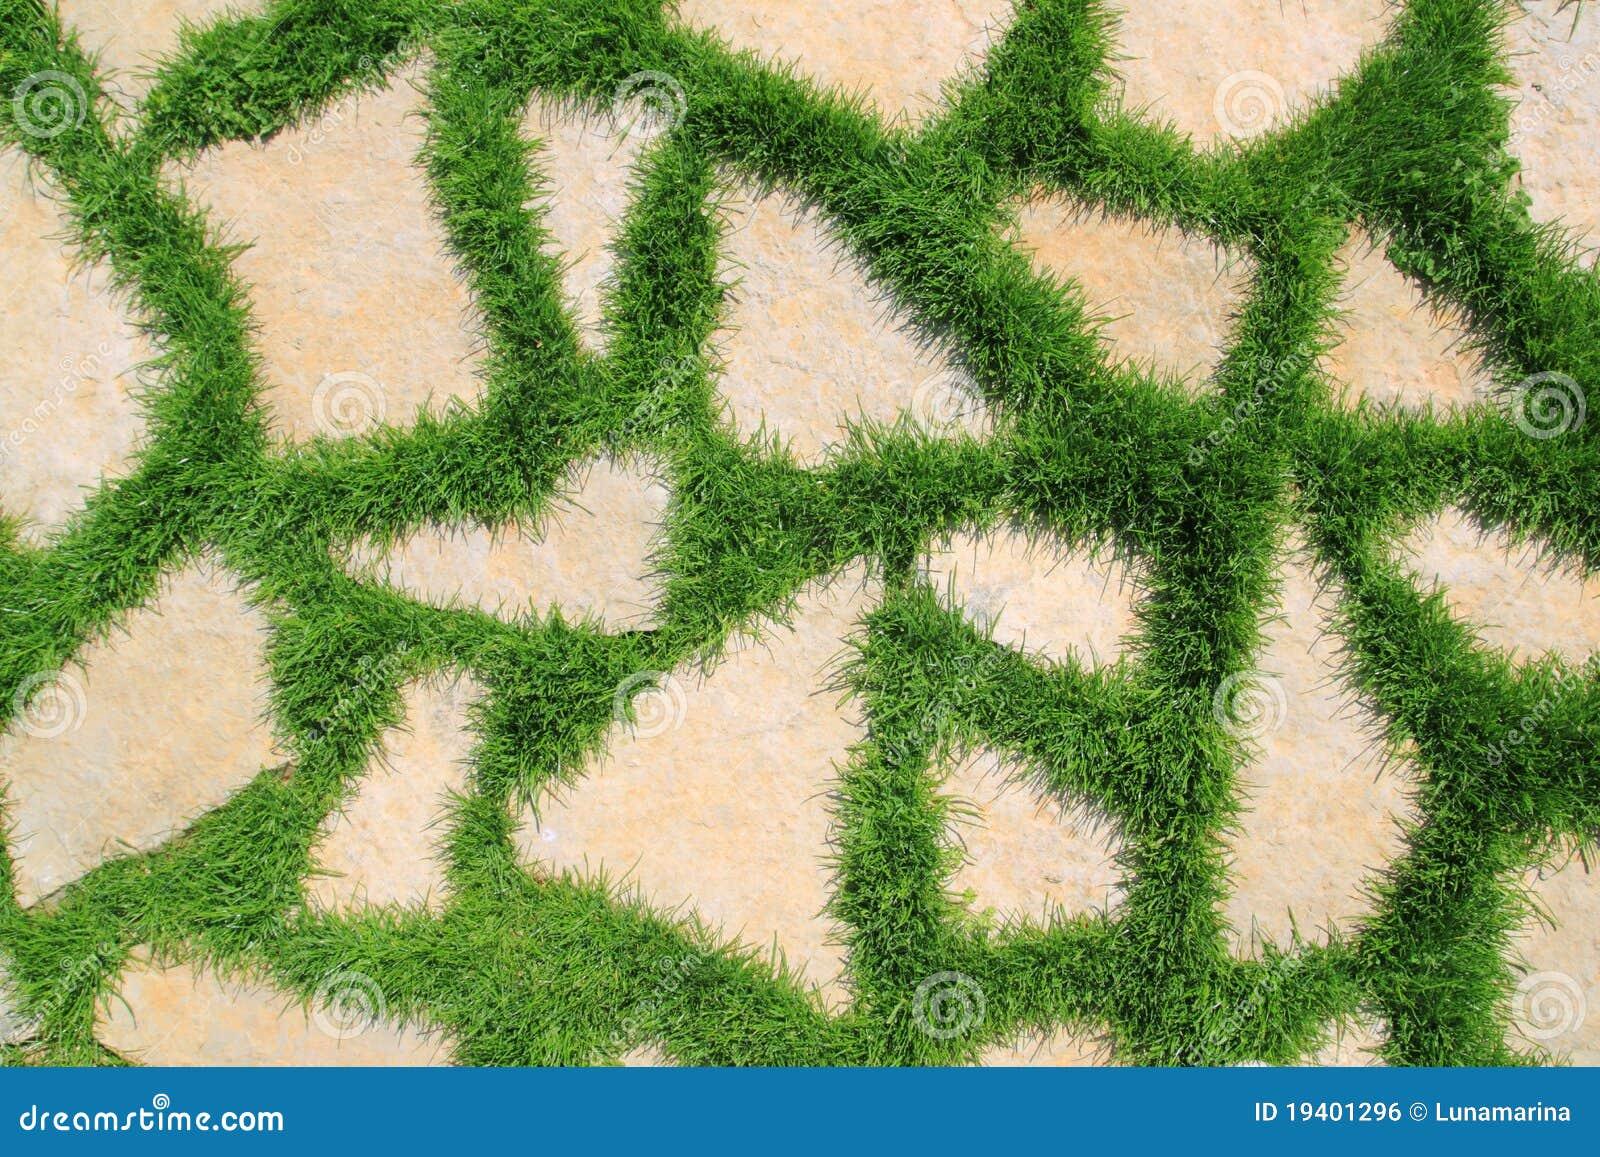 Stone path in green grass garden texture stock photo for Camino de piedra jardin